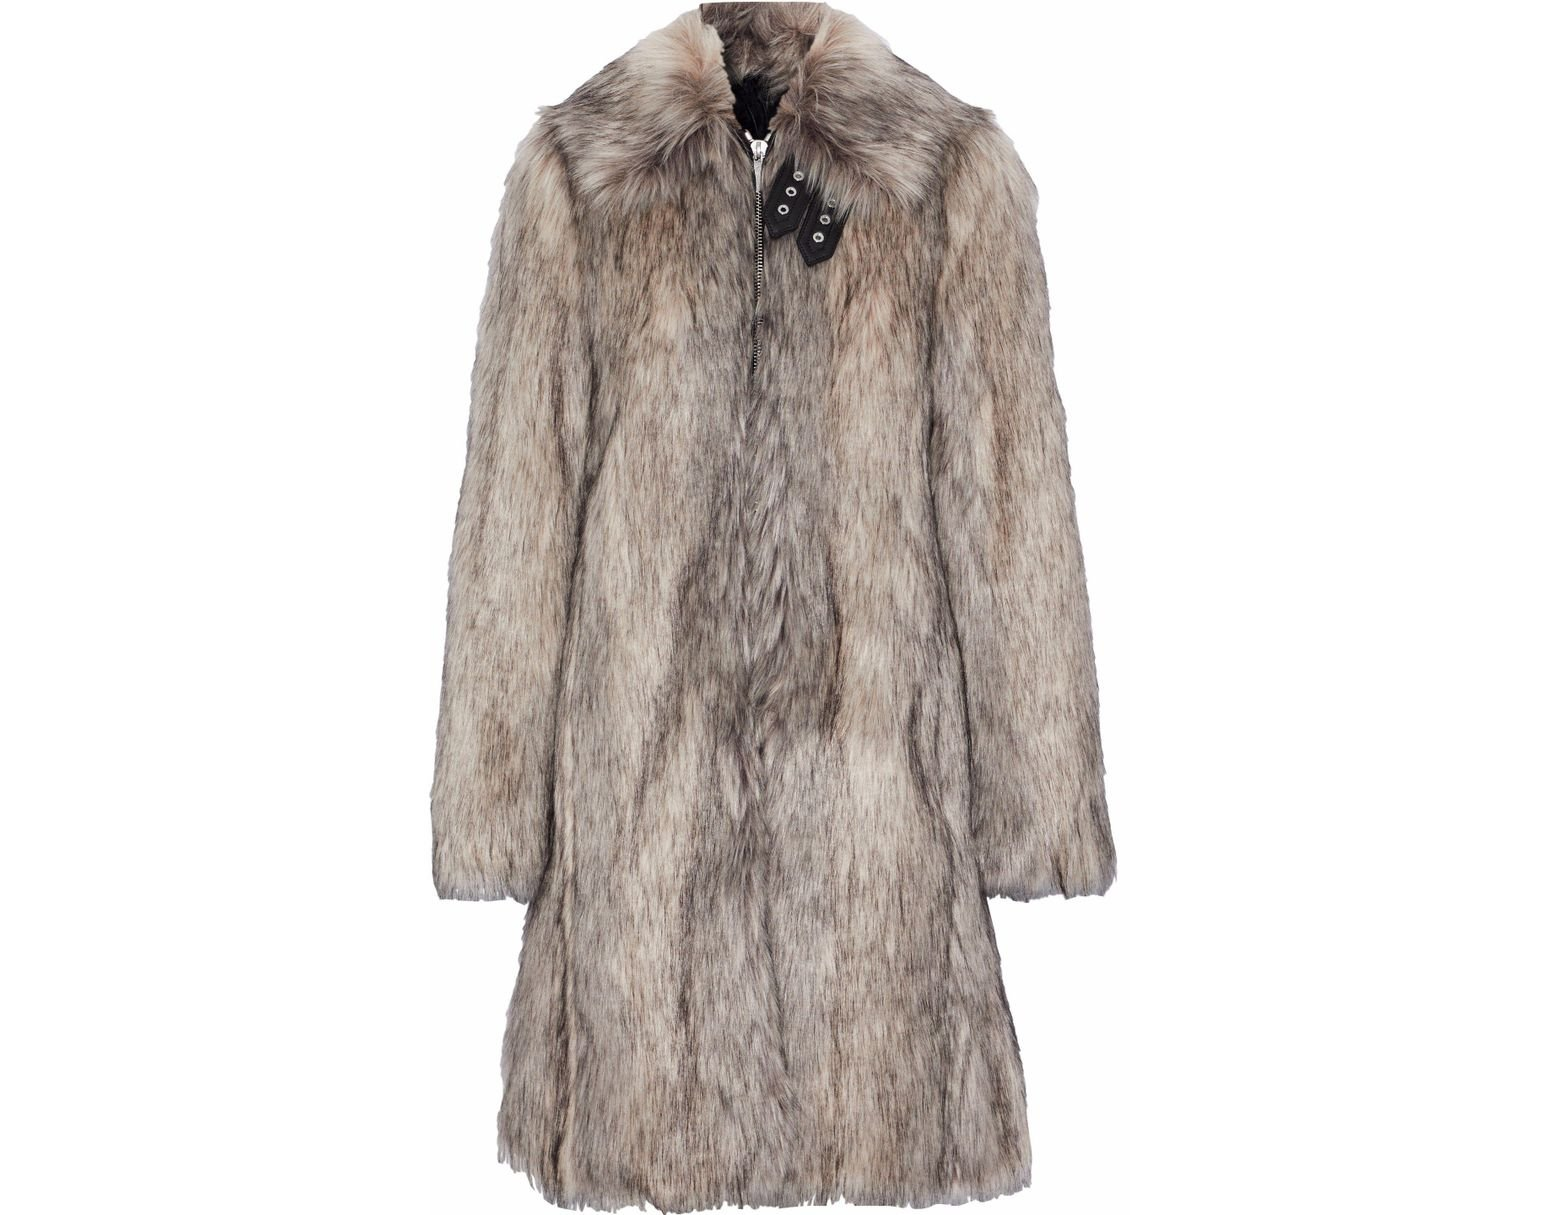 Wolf Fur Coat >> Women S Wolf Leather Trimmed Faux Fur Coat Mushroom